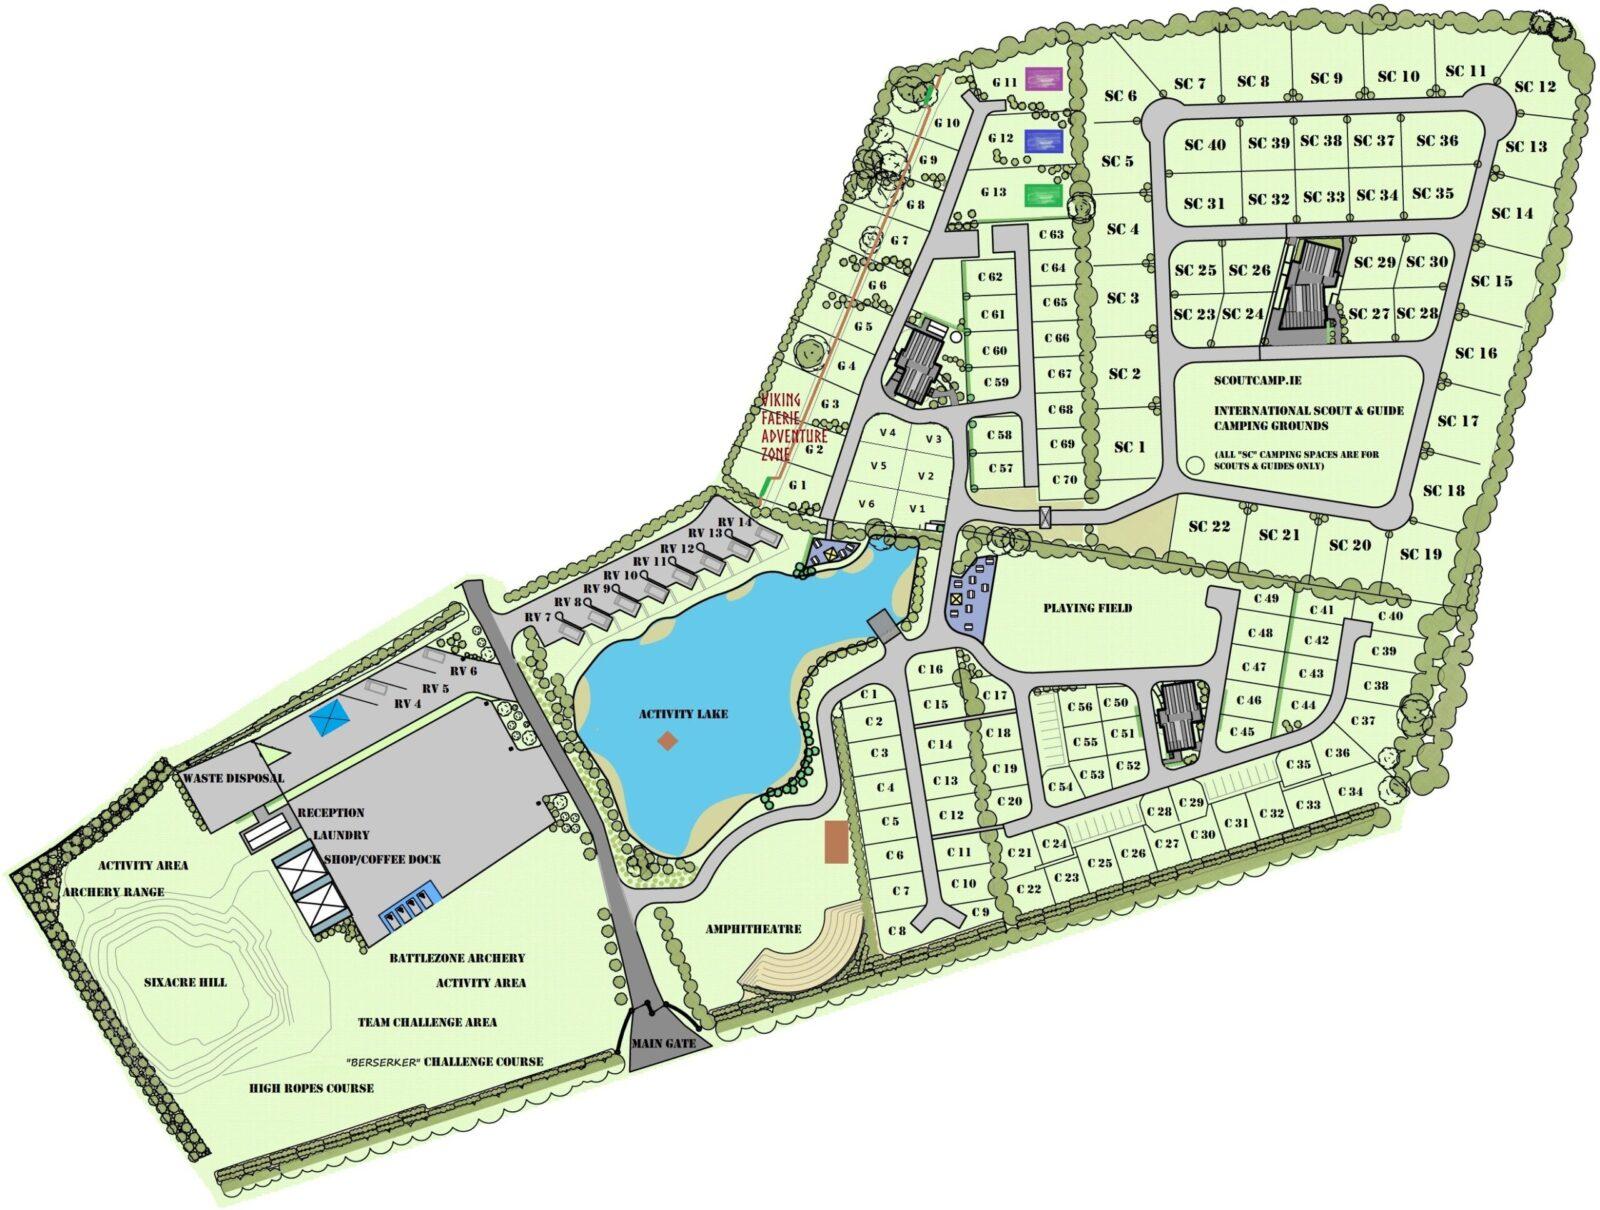 IOAC Map 2021